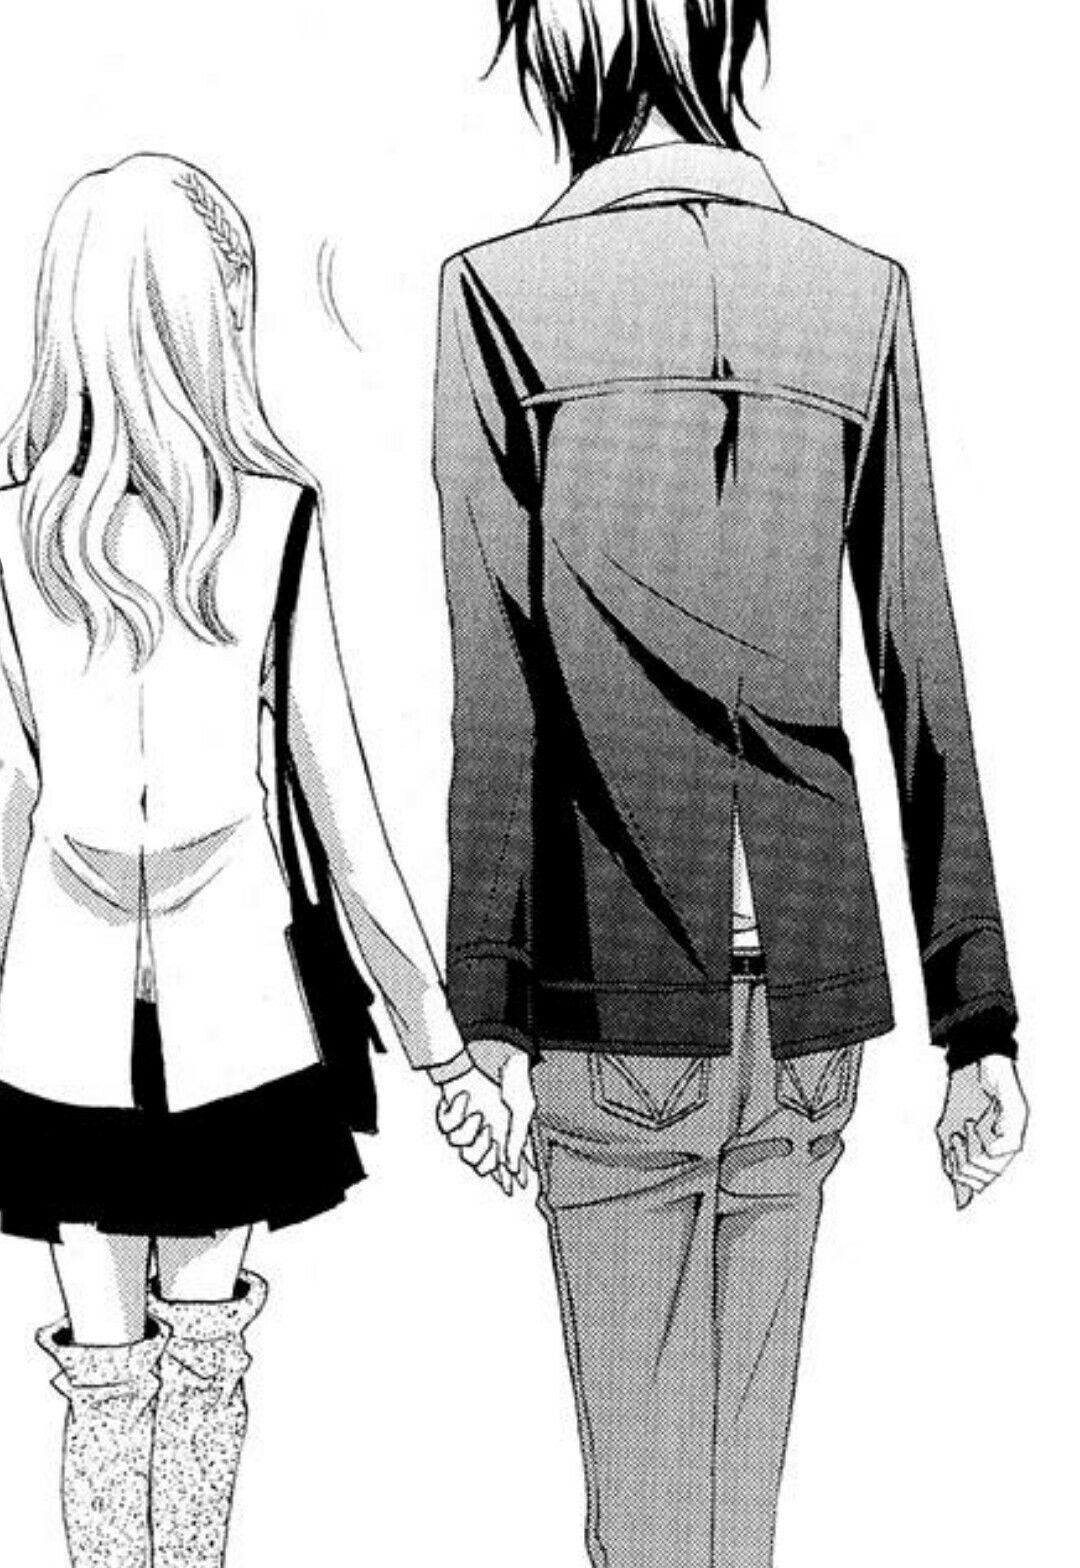 Hakoniwa telepathy manga shoujo couple romance love cute style fashion tumblr boy and girl hold hand